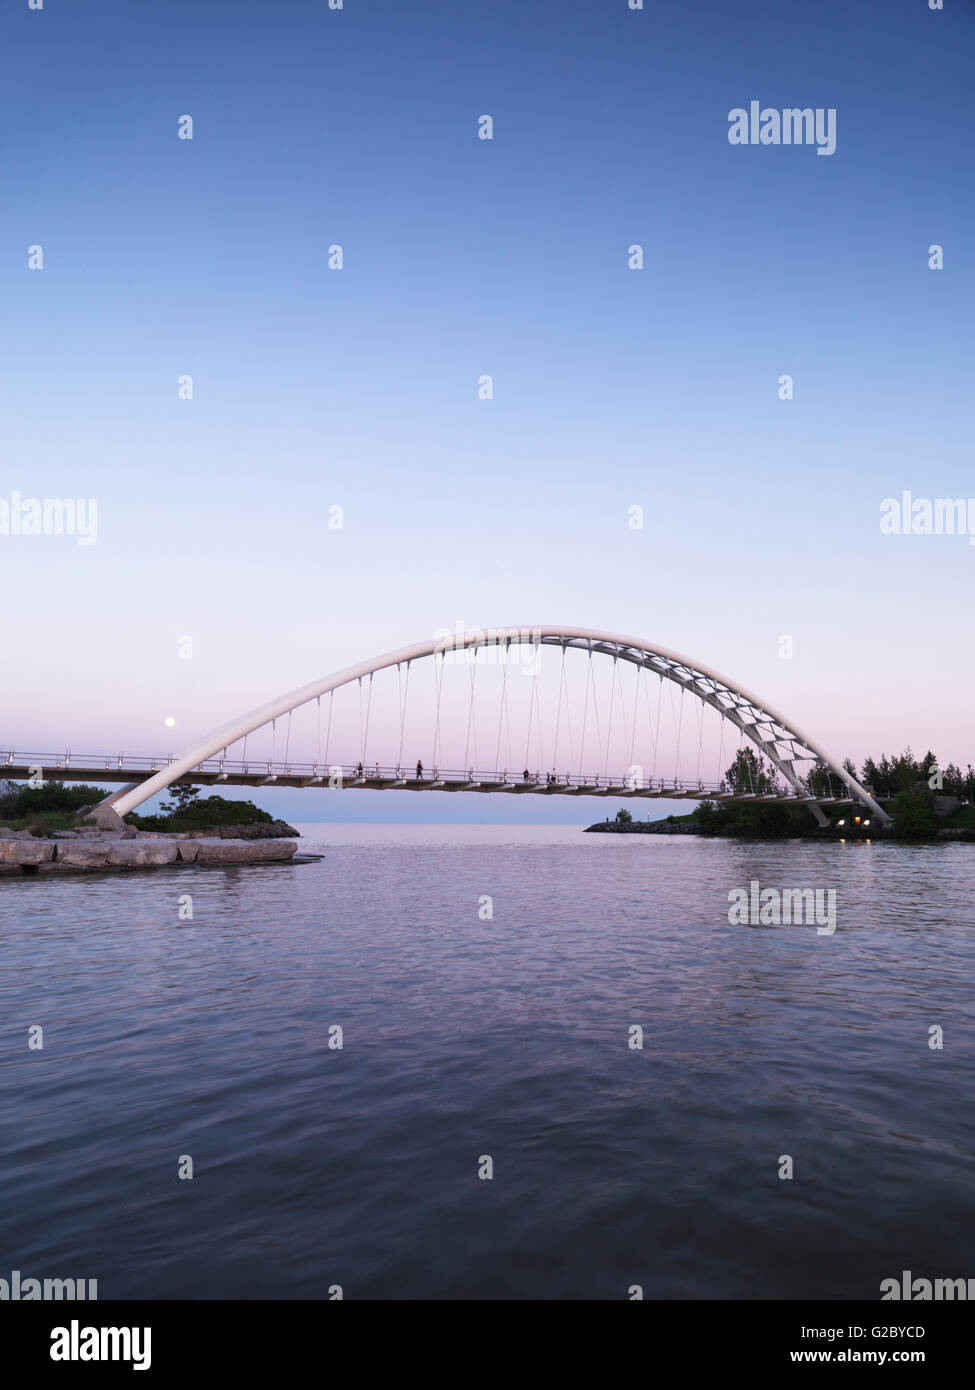 Humber River Arch Bridge, Toronto, Ontario Province, Canada - Stock Image